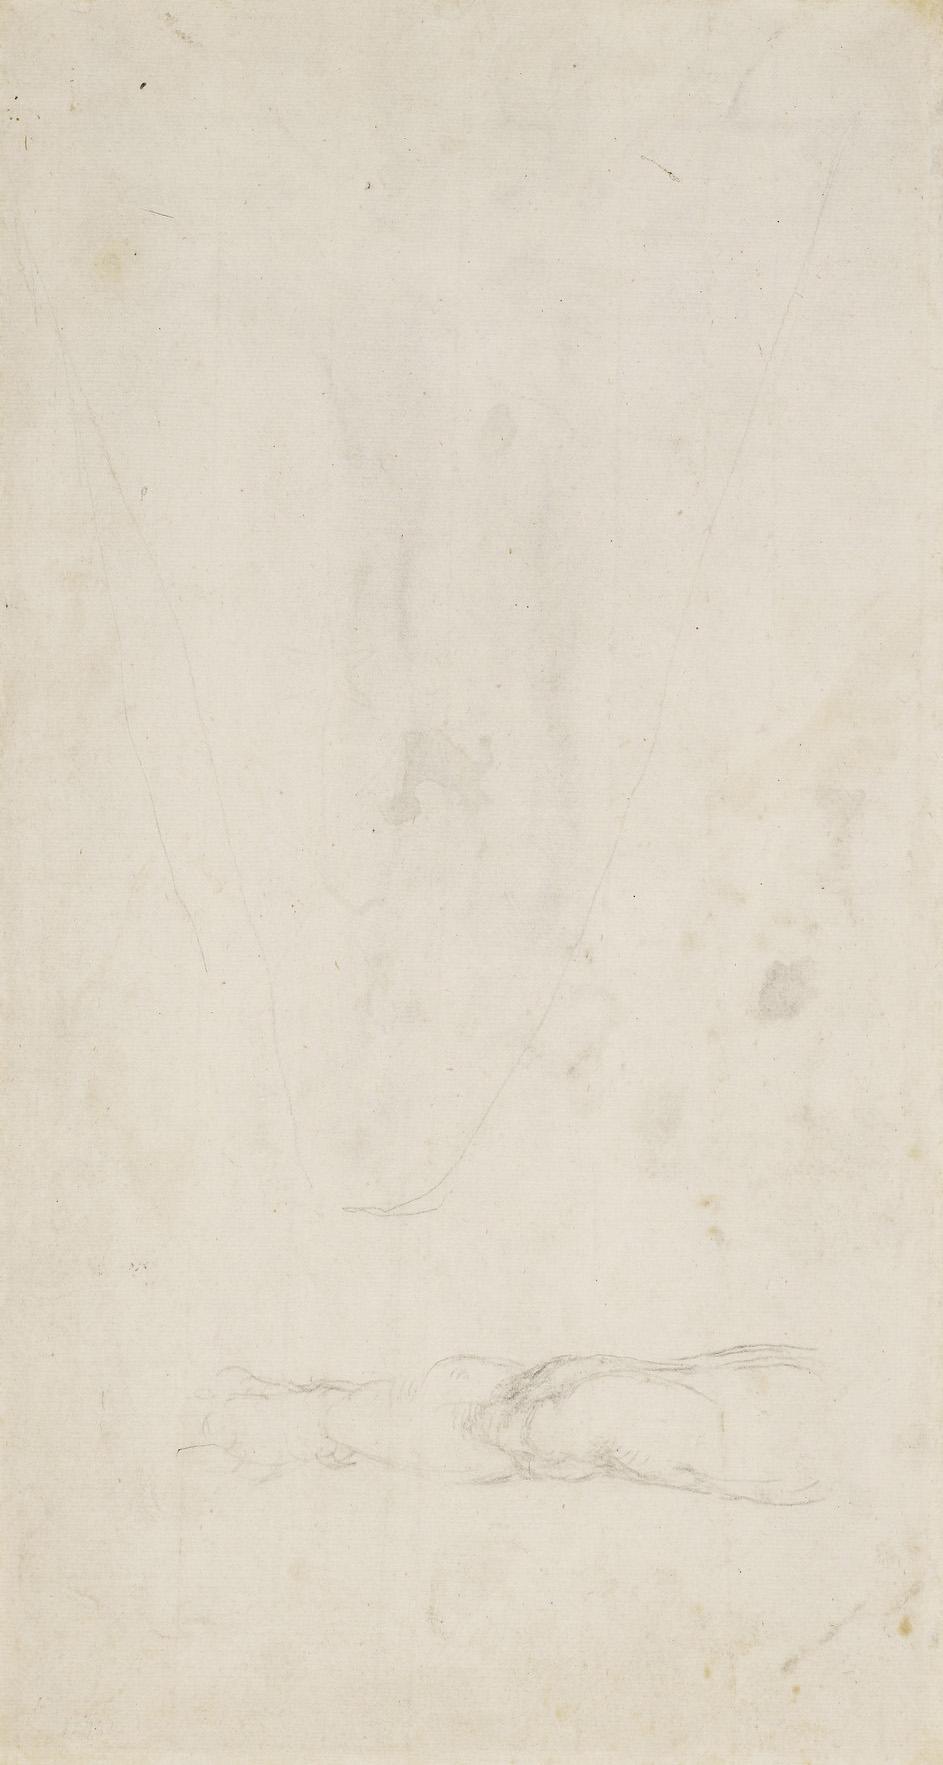 Michelangelo-Buonarroti--Drawing---Verso Leg.jpg